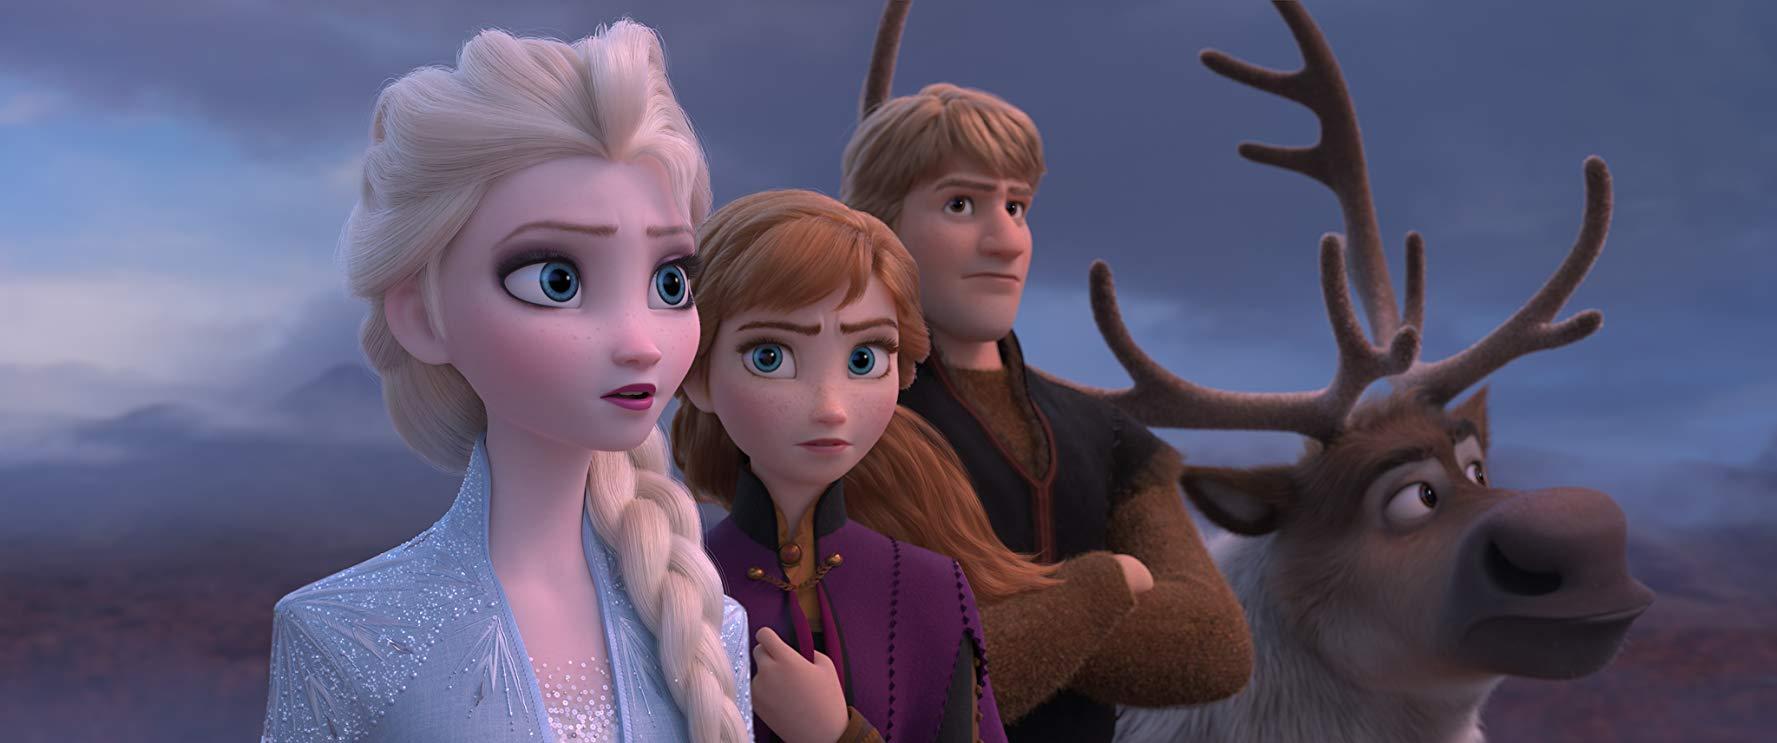 Frozen 2 to drop early on Disney +